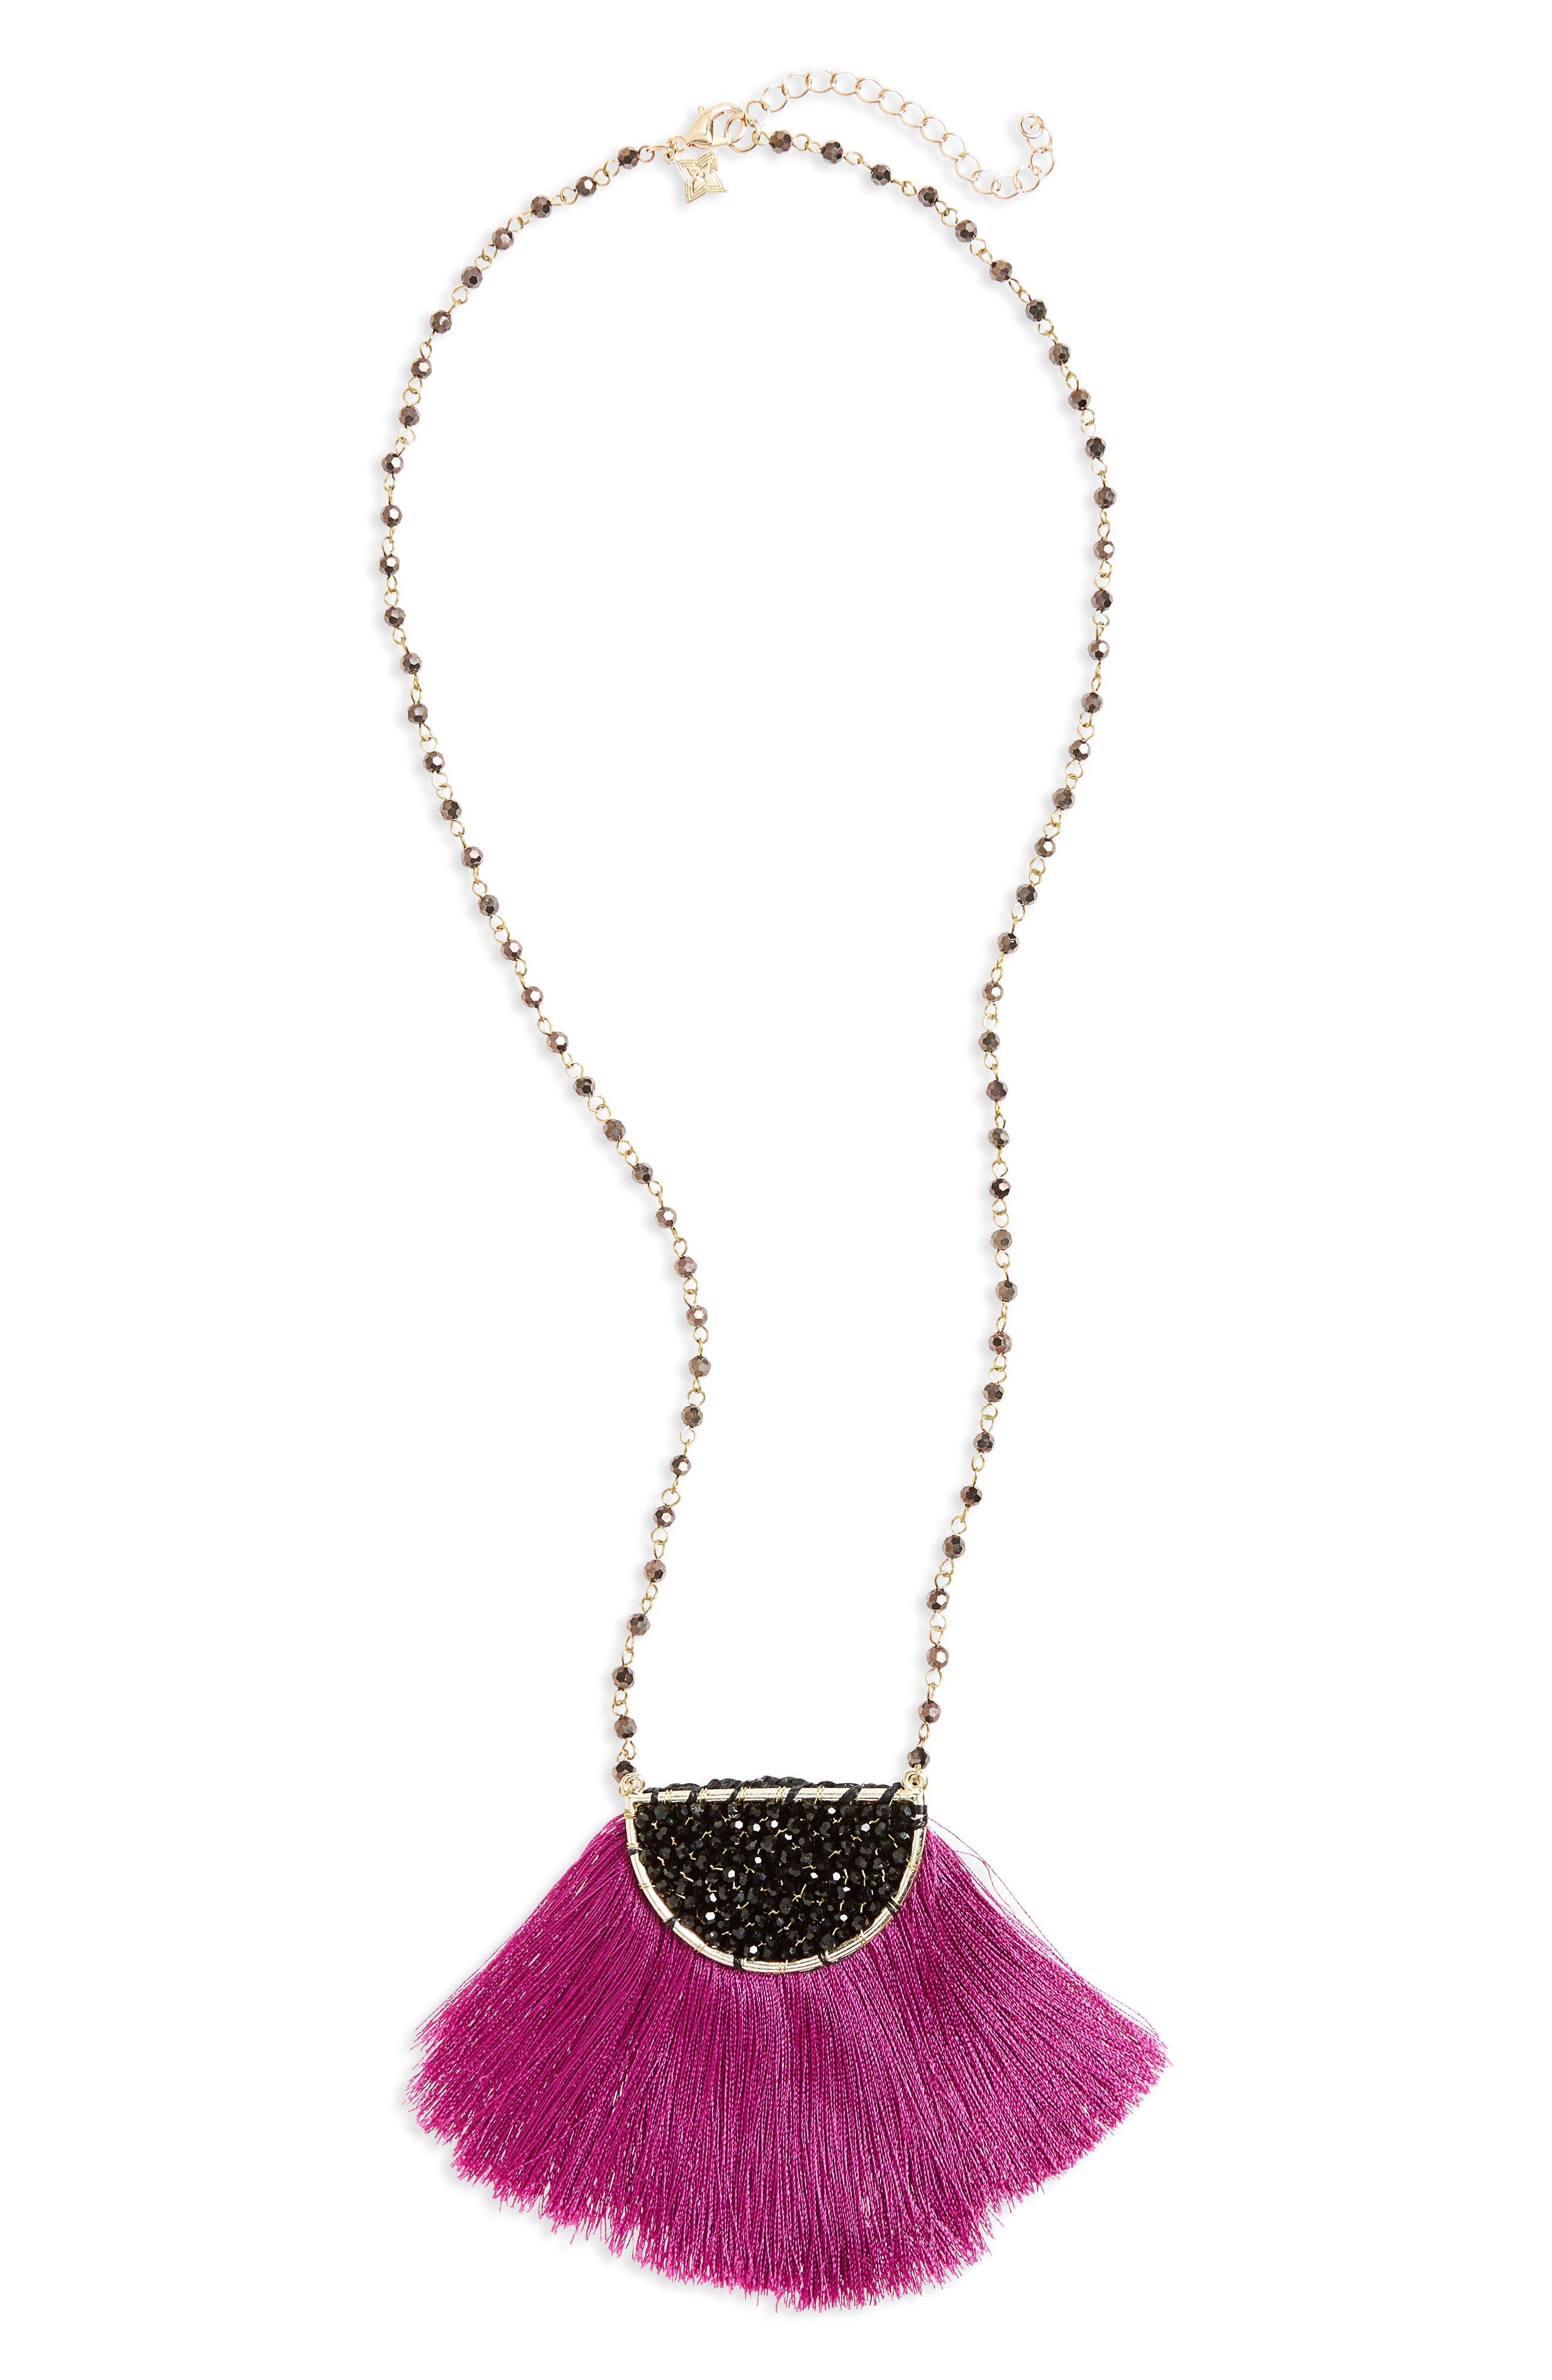 Fringe Pendant Necklace,                         Main,                         color, Multi/ Fuchsia